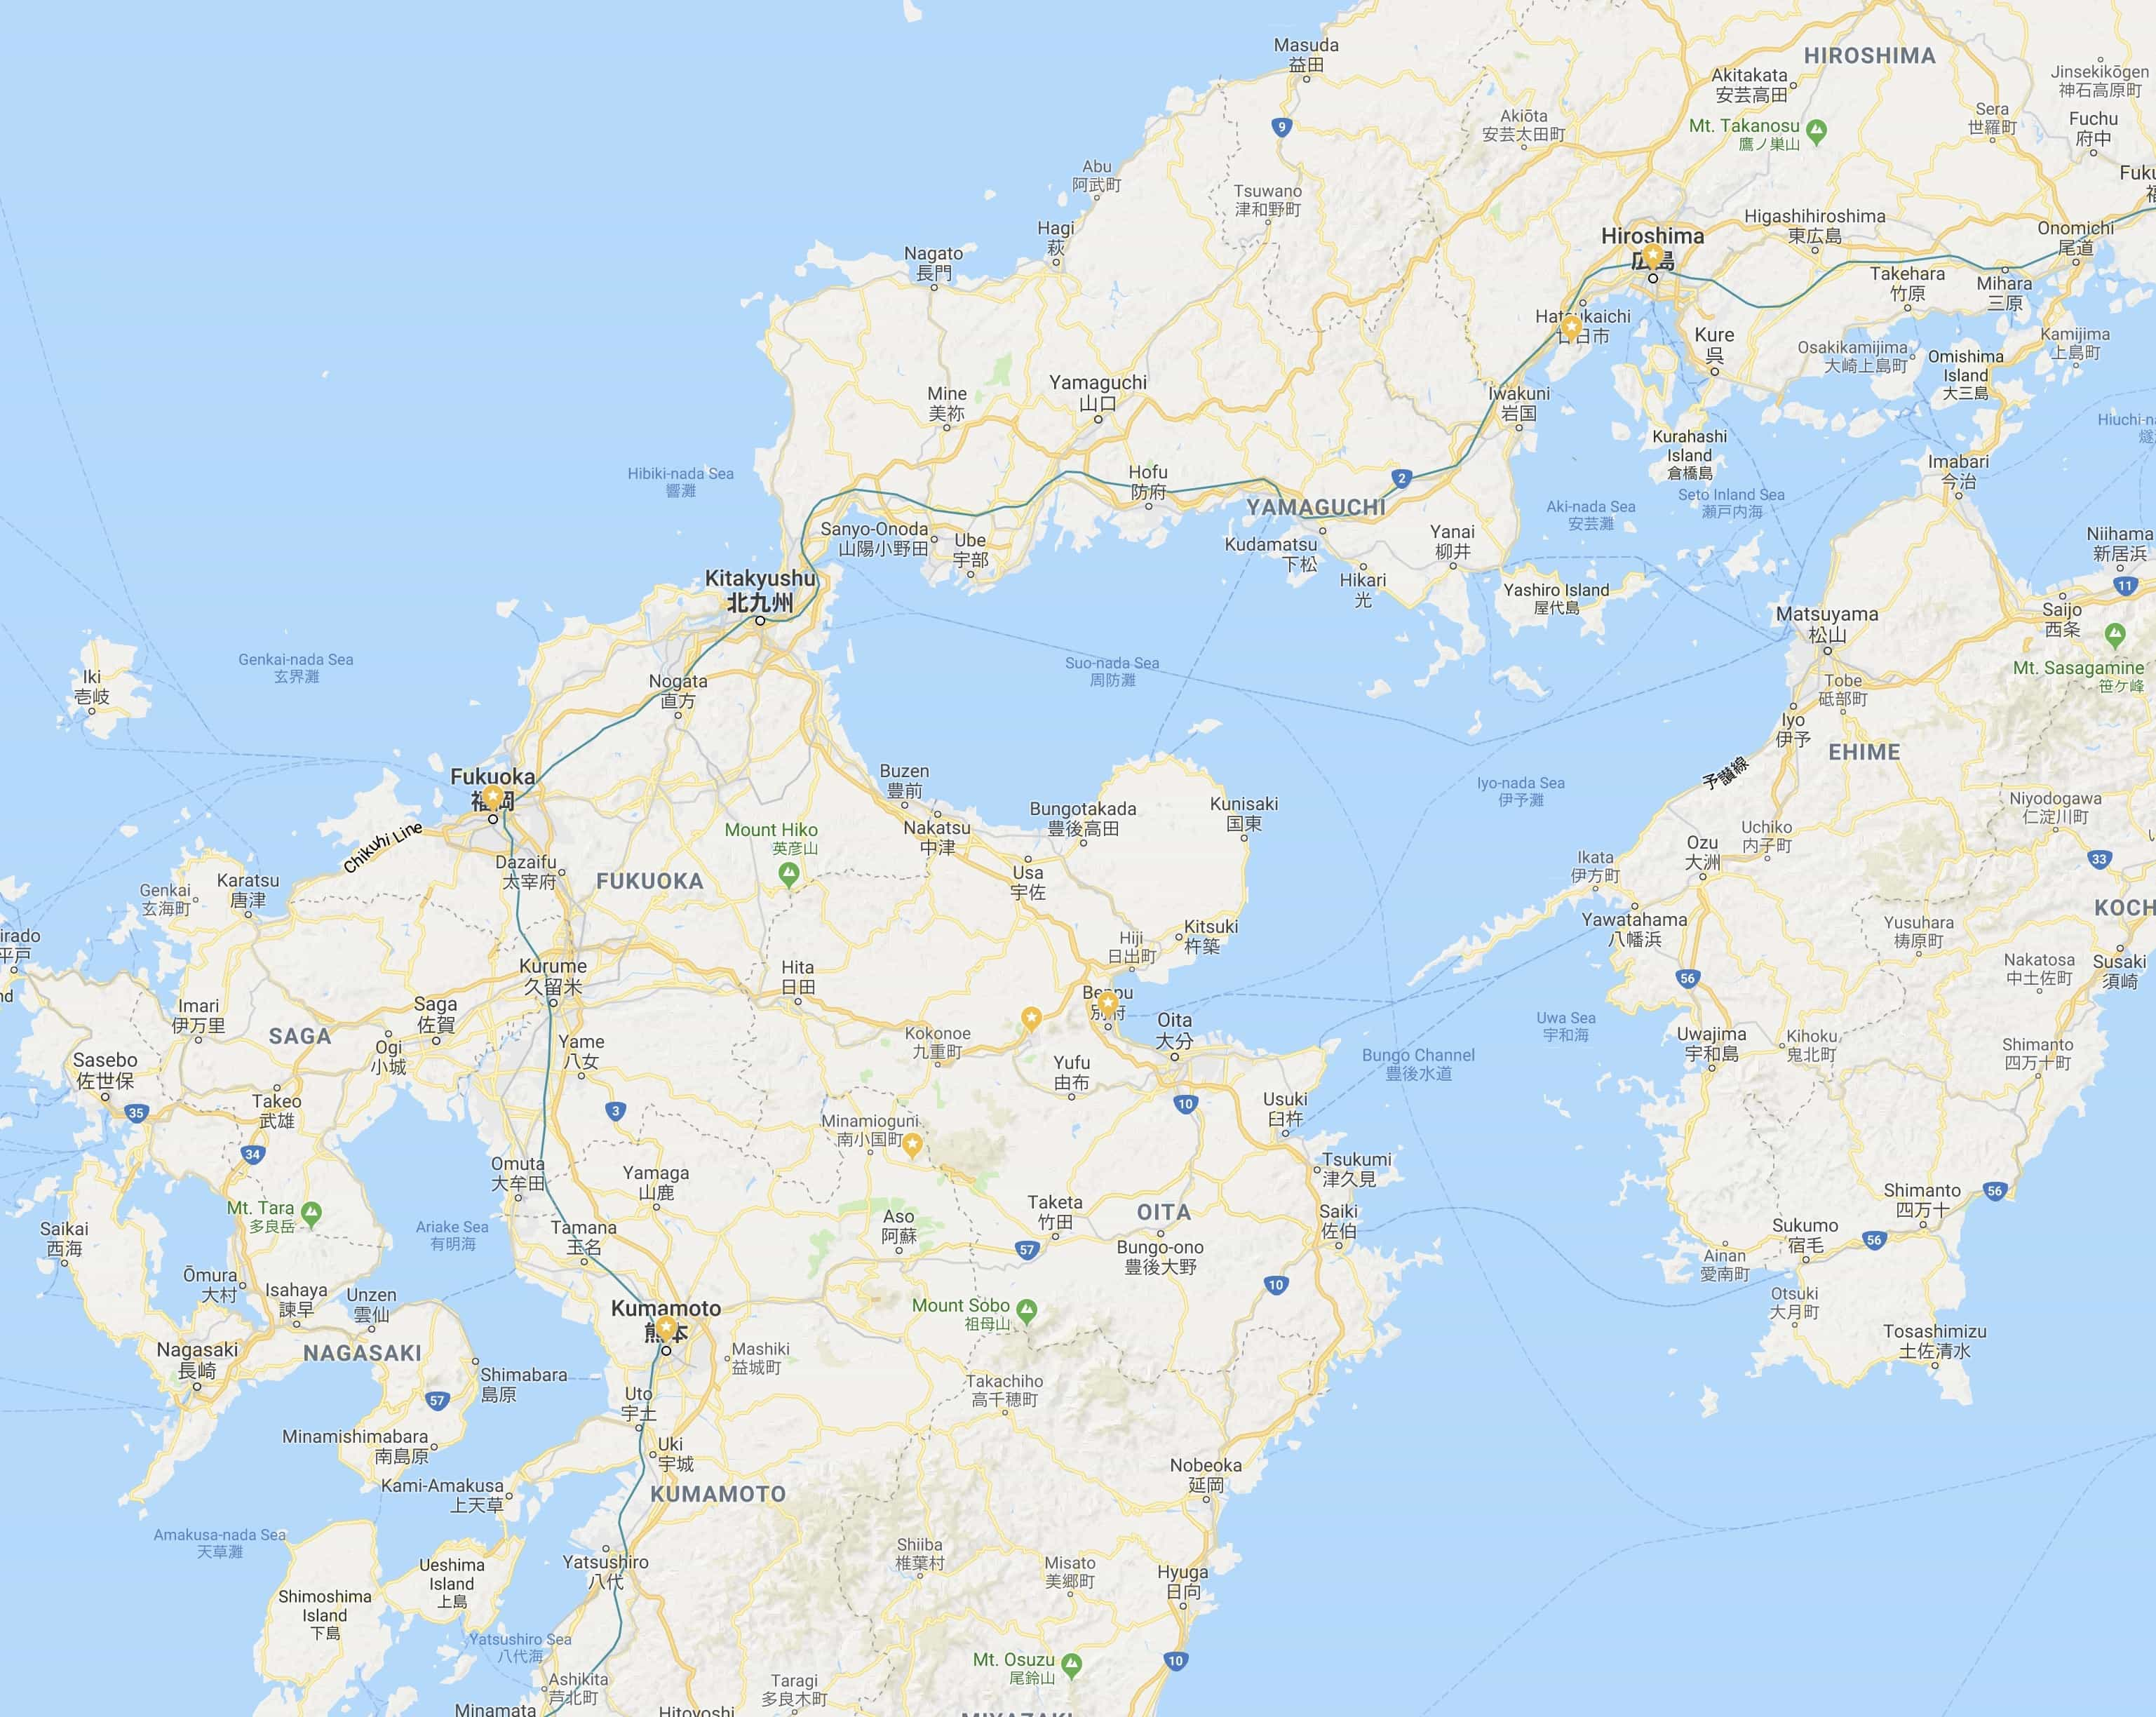 Hiroshima Japan Guide 広島旅行ガイド • Just One Cookbook